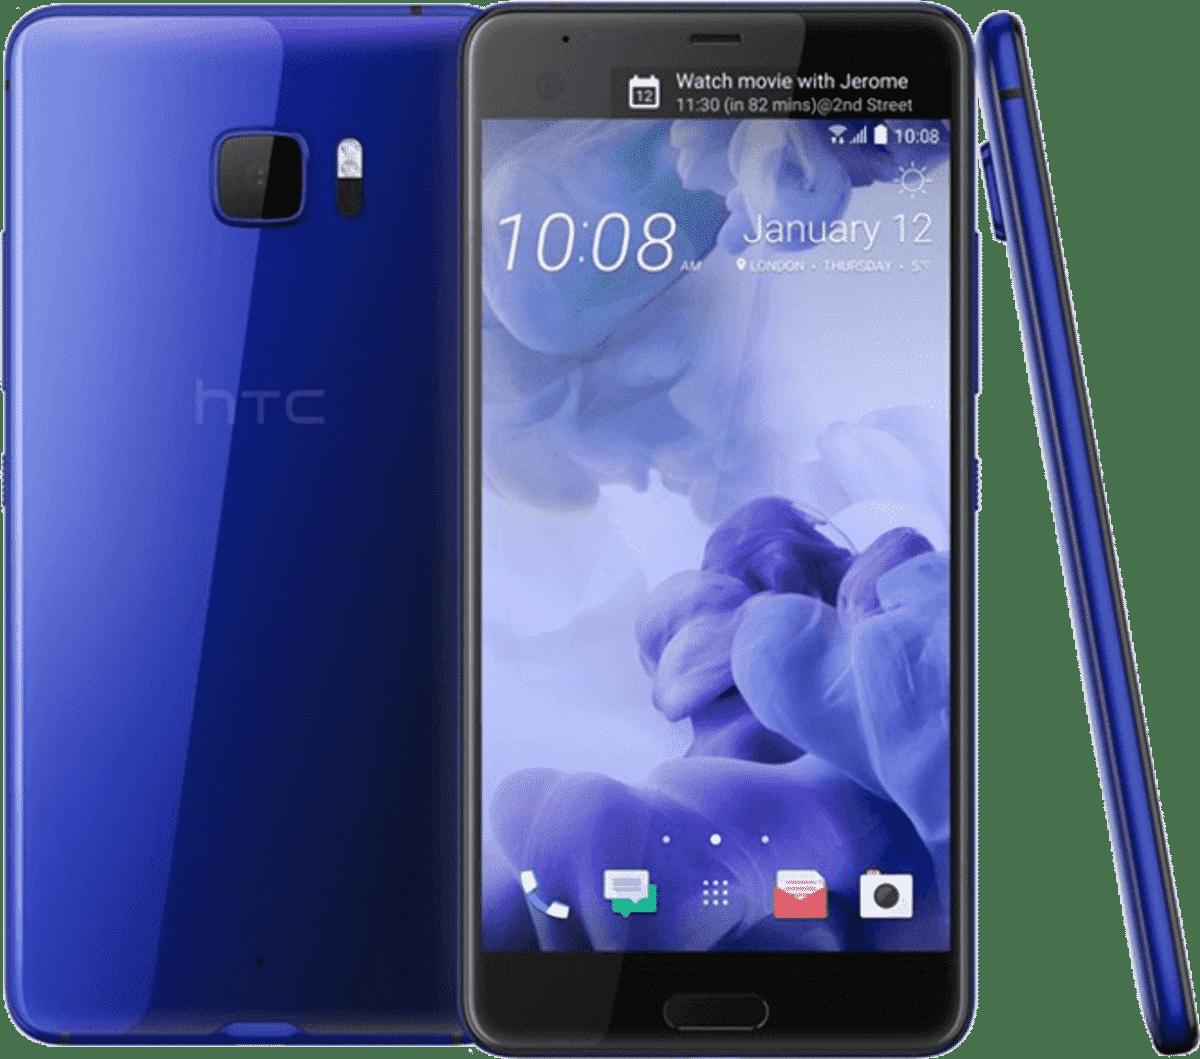 htc ultra 64gb blauw indigo blue